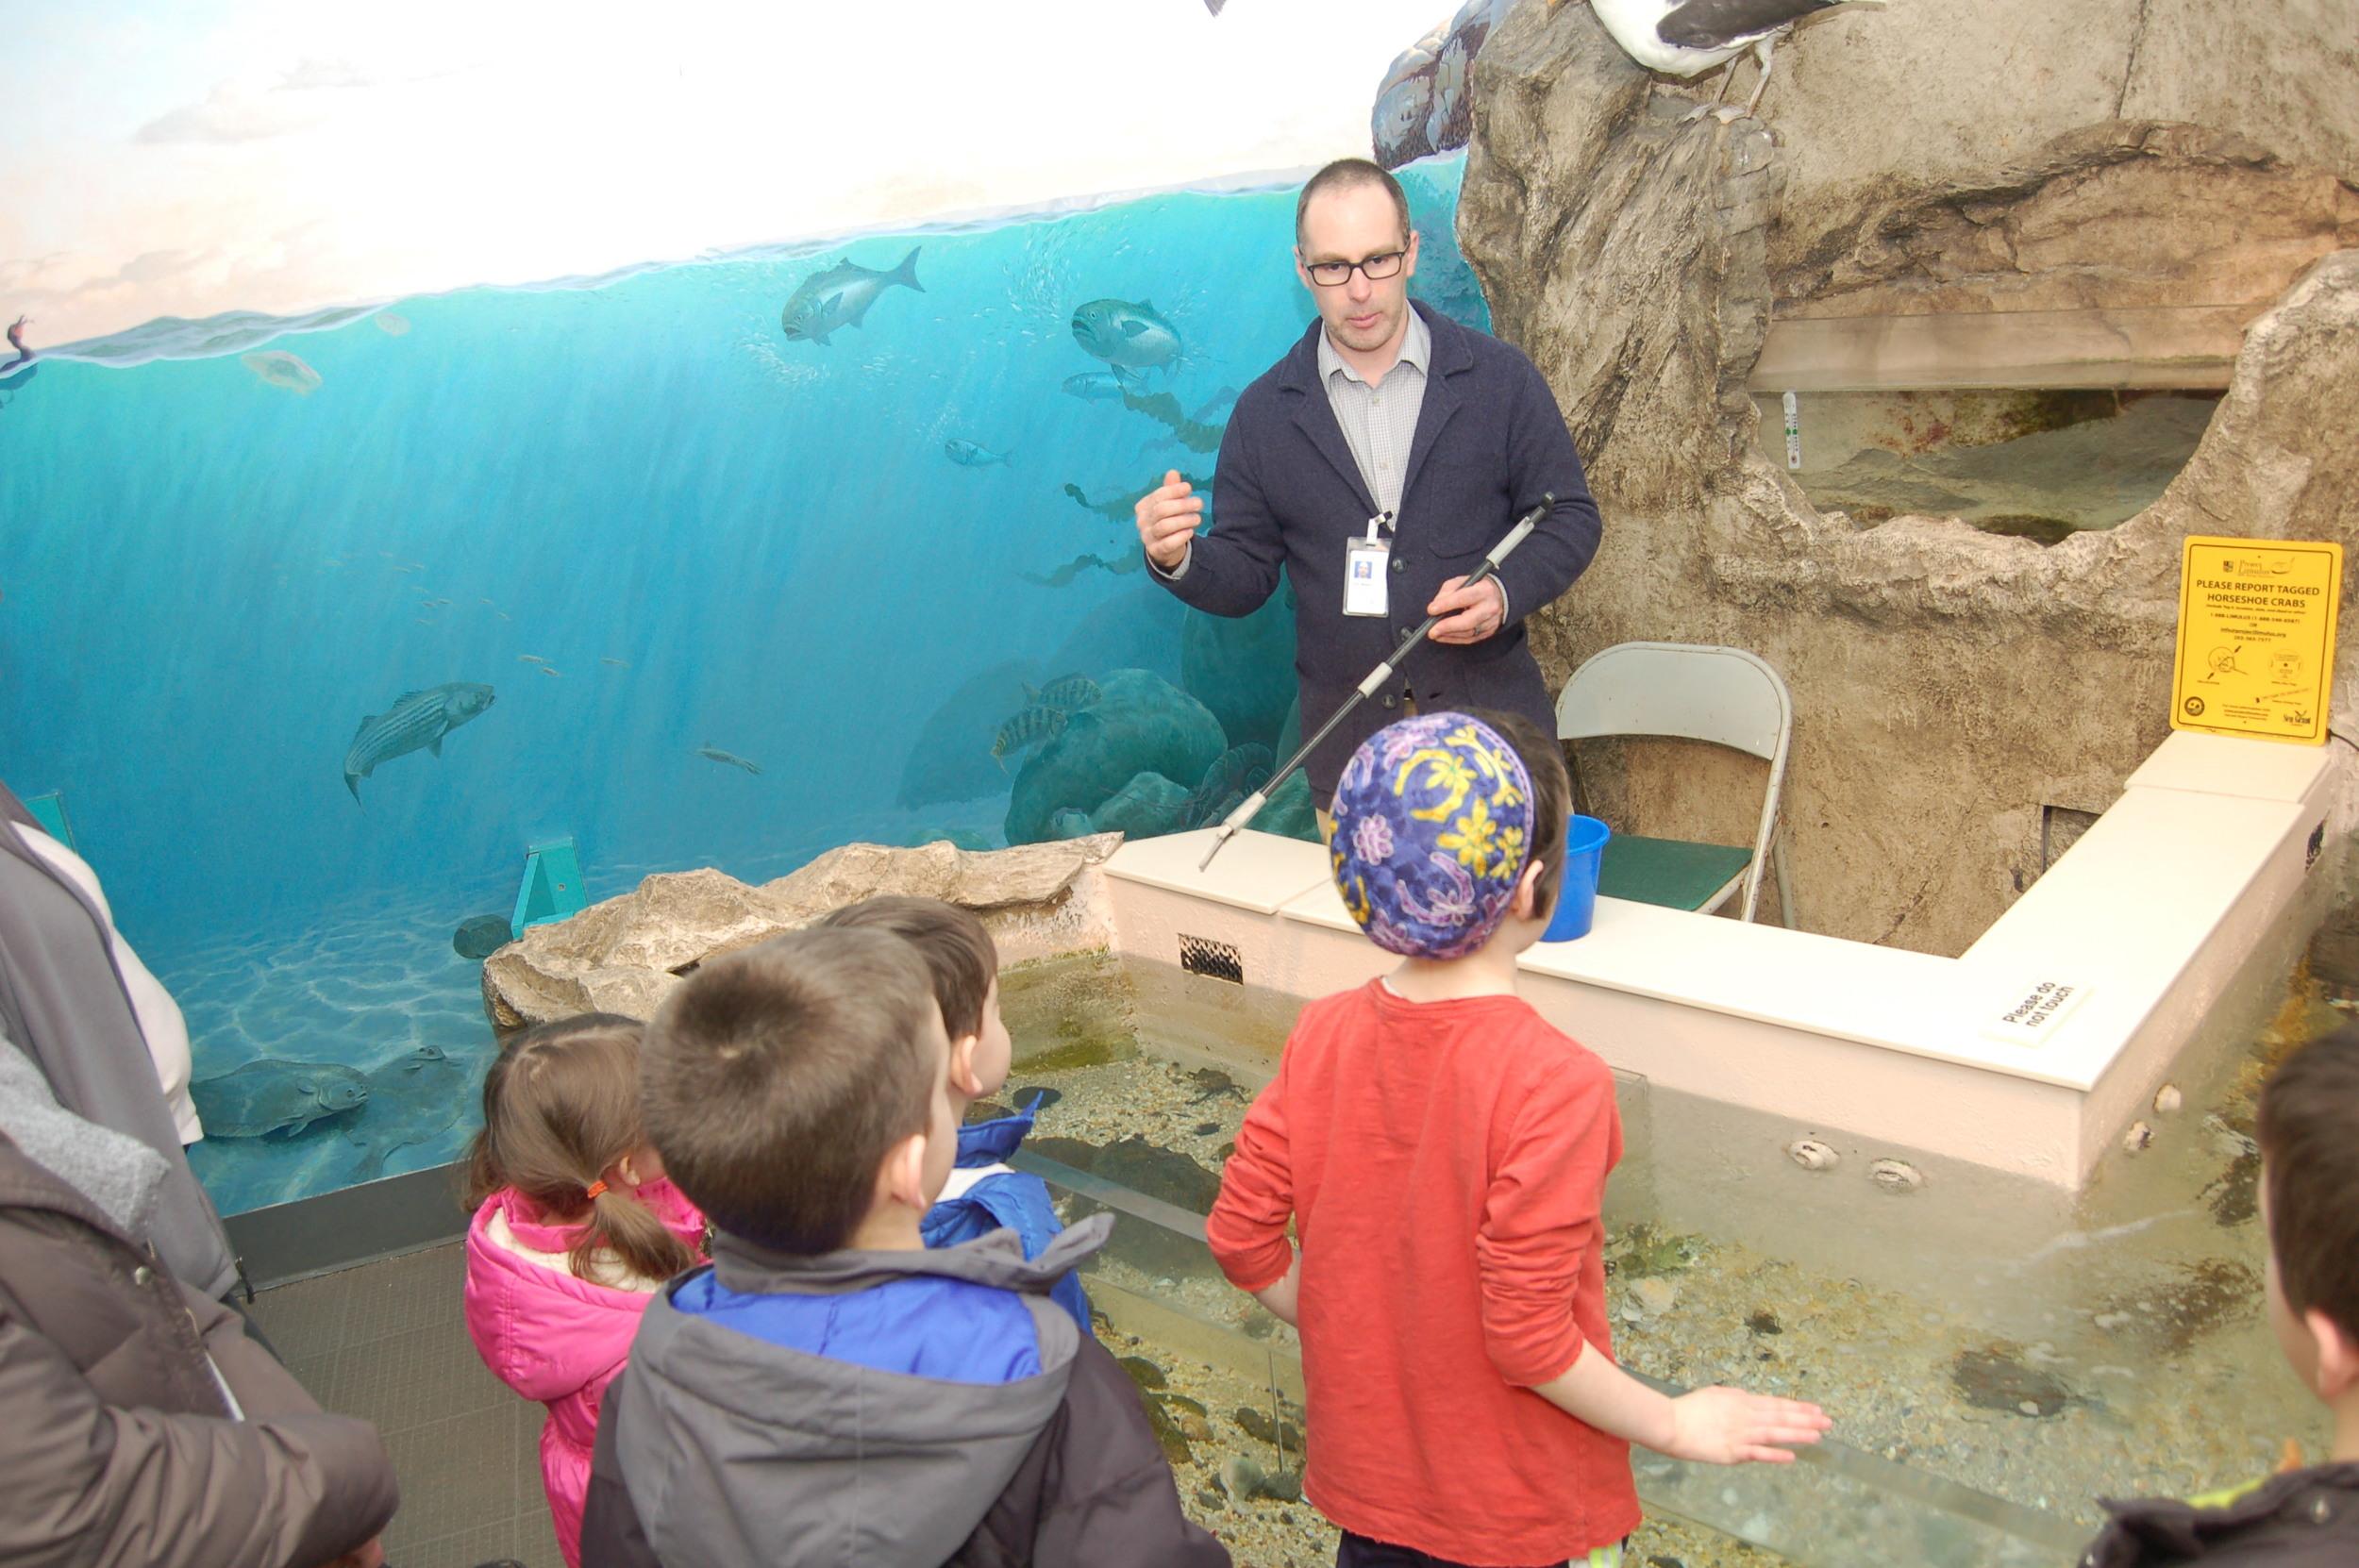 Children enjoy watching the marine aquarium inhabitants being fed. Photo by Cynthia Ehlinger.